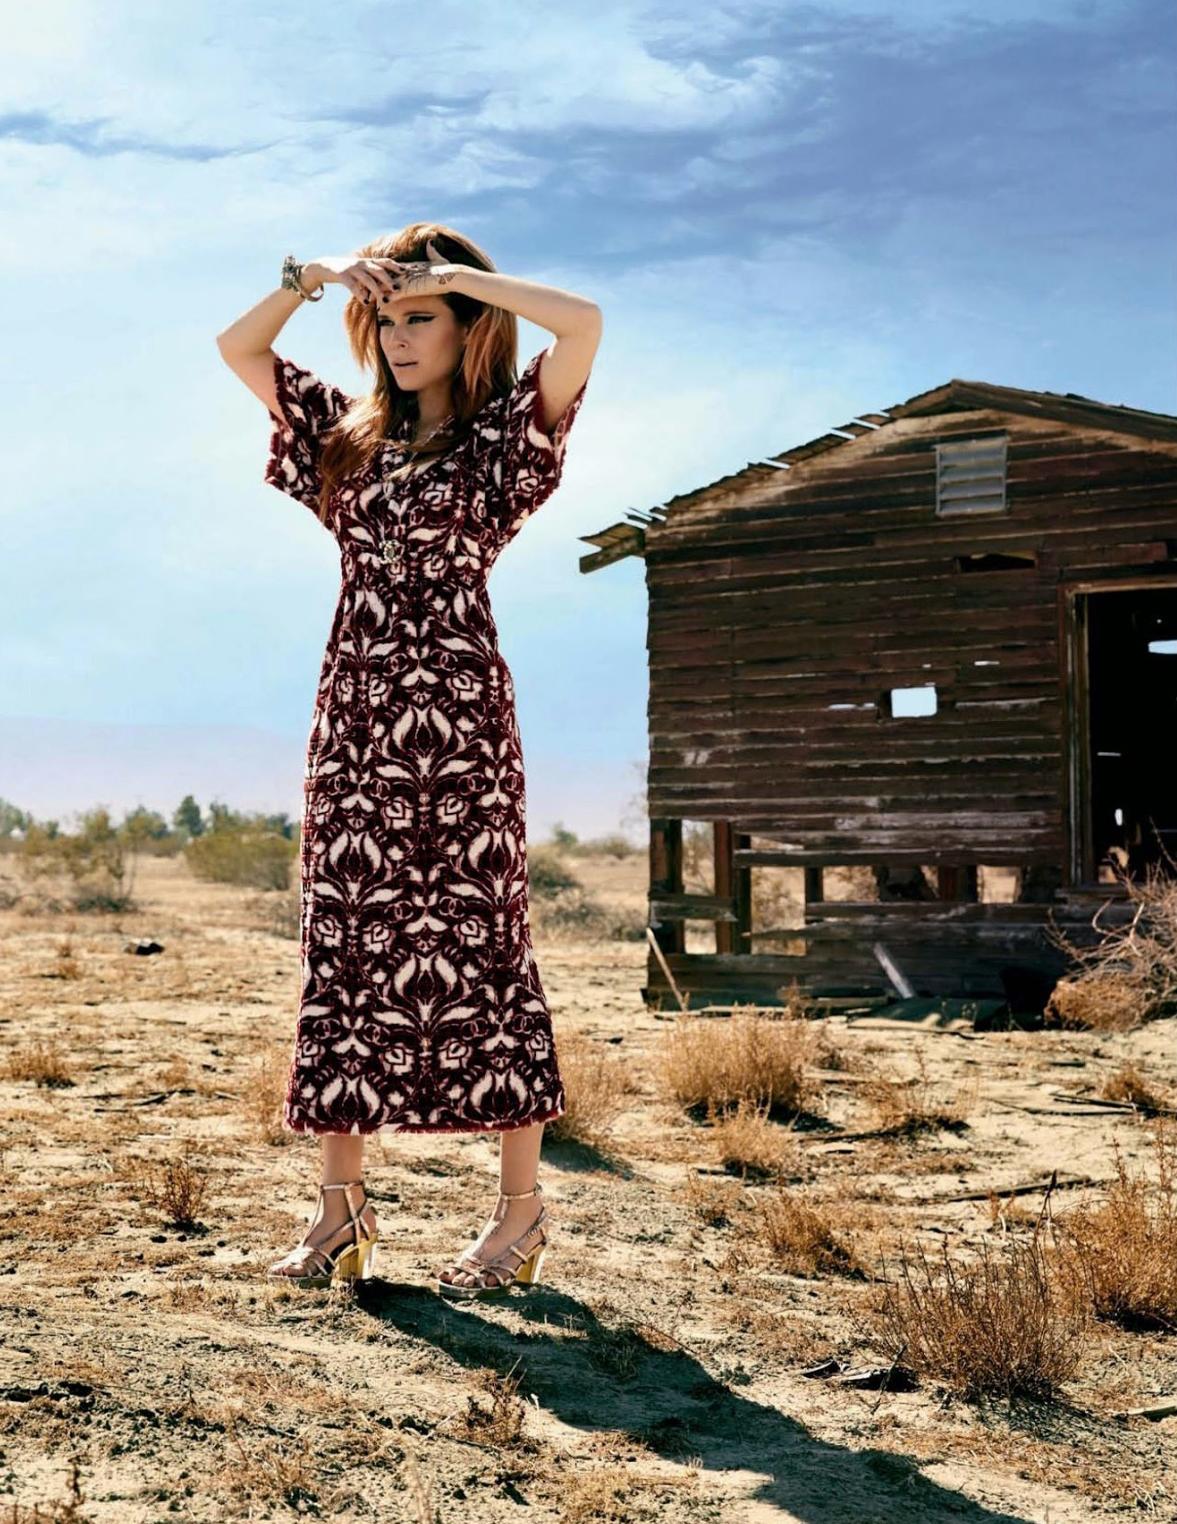 Kate_Mara_Harpers_Bazaar_Arabia_Photohouse_Productions_2.jpg